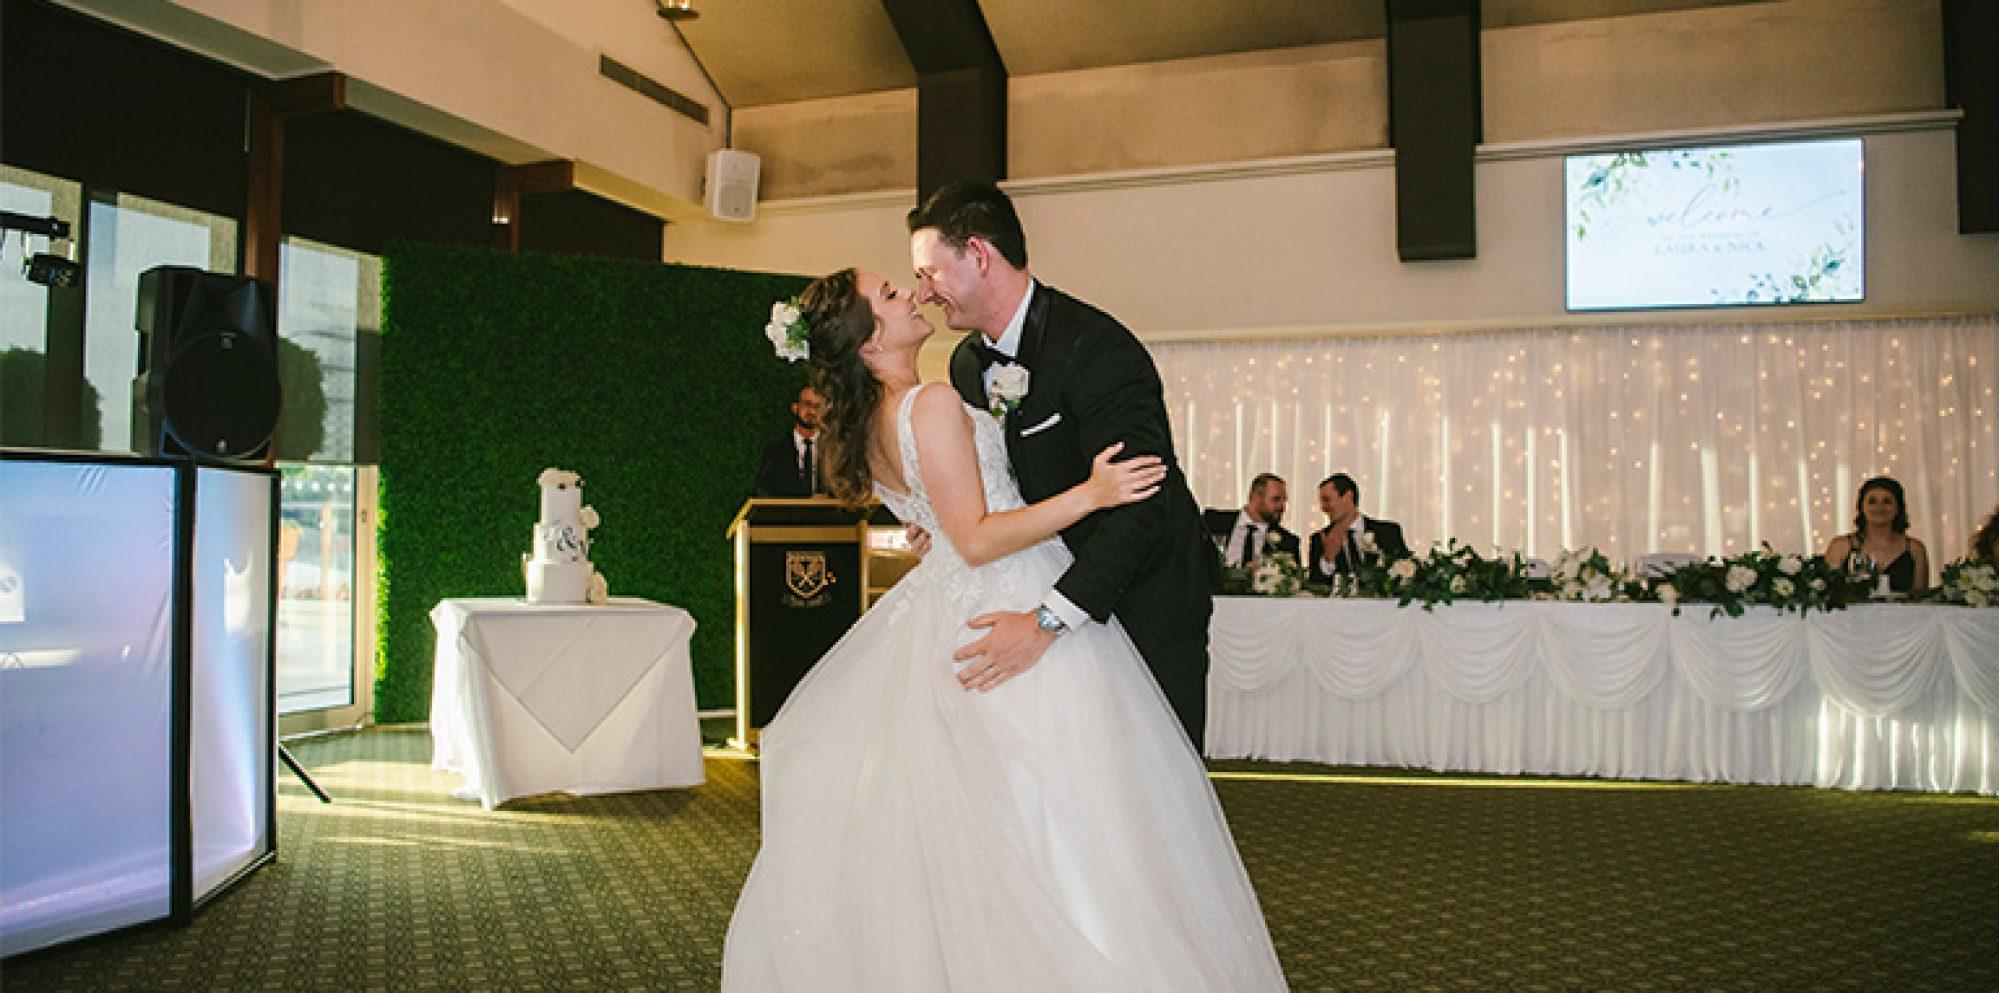 Laura & nick melbourne wedding videography @ kooyong lawn tennis club